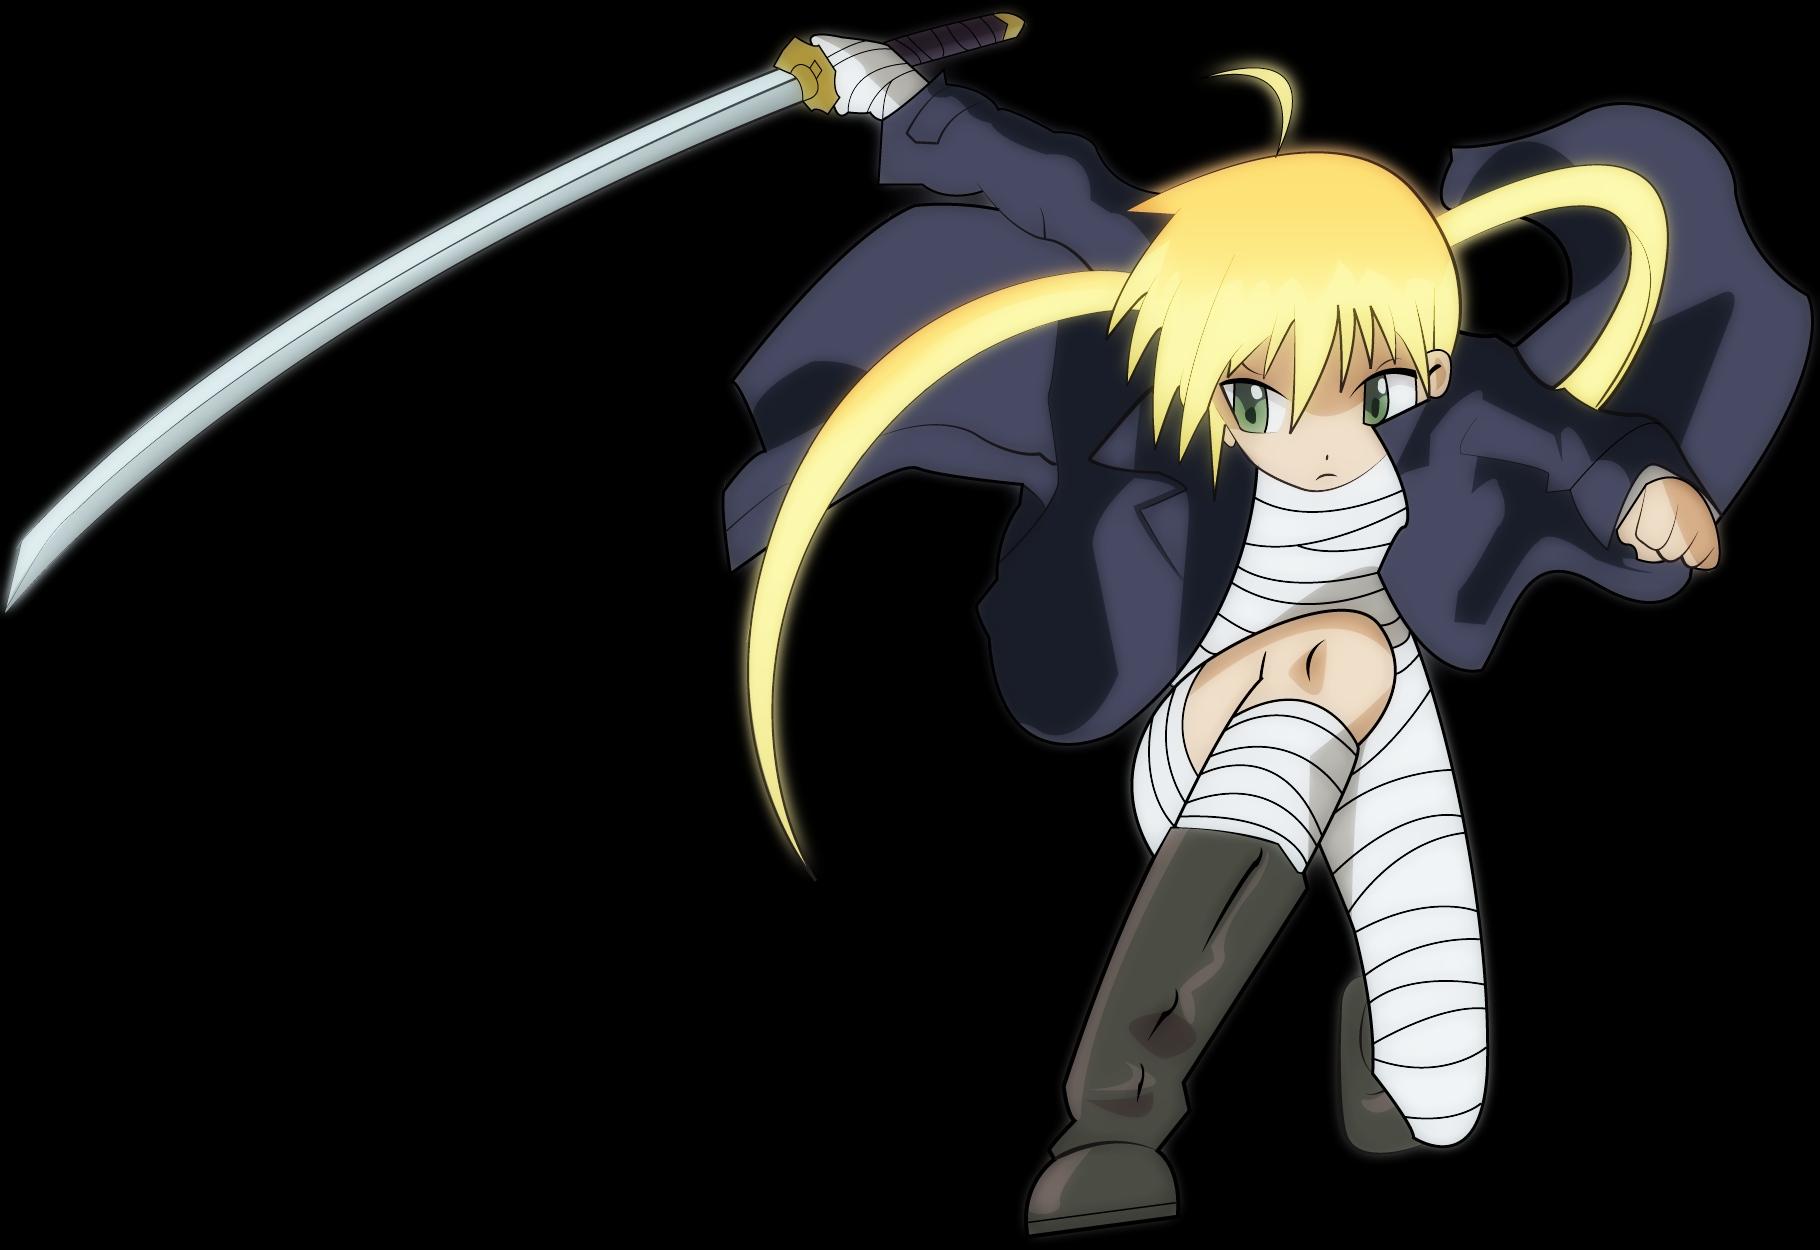 bandage hayate_no_gotoku katana loli sanzenin_nagi sword transparent weapon